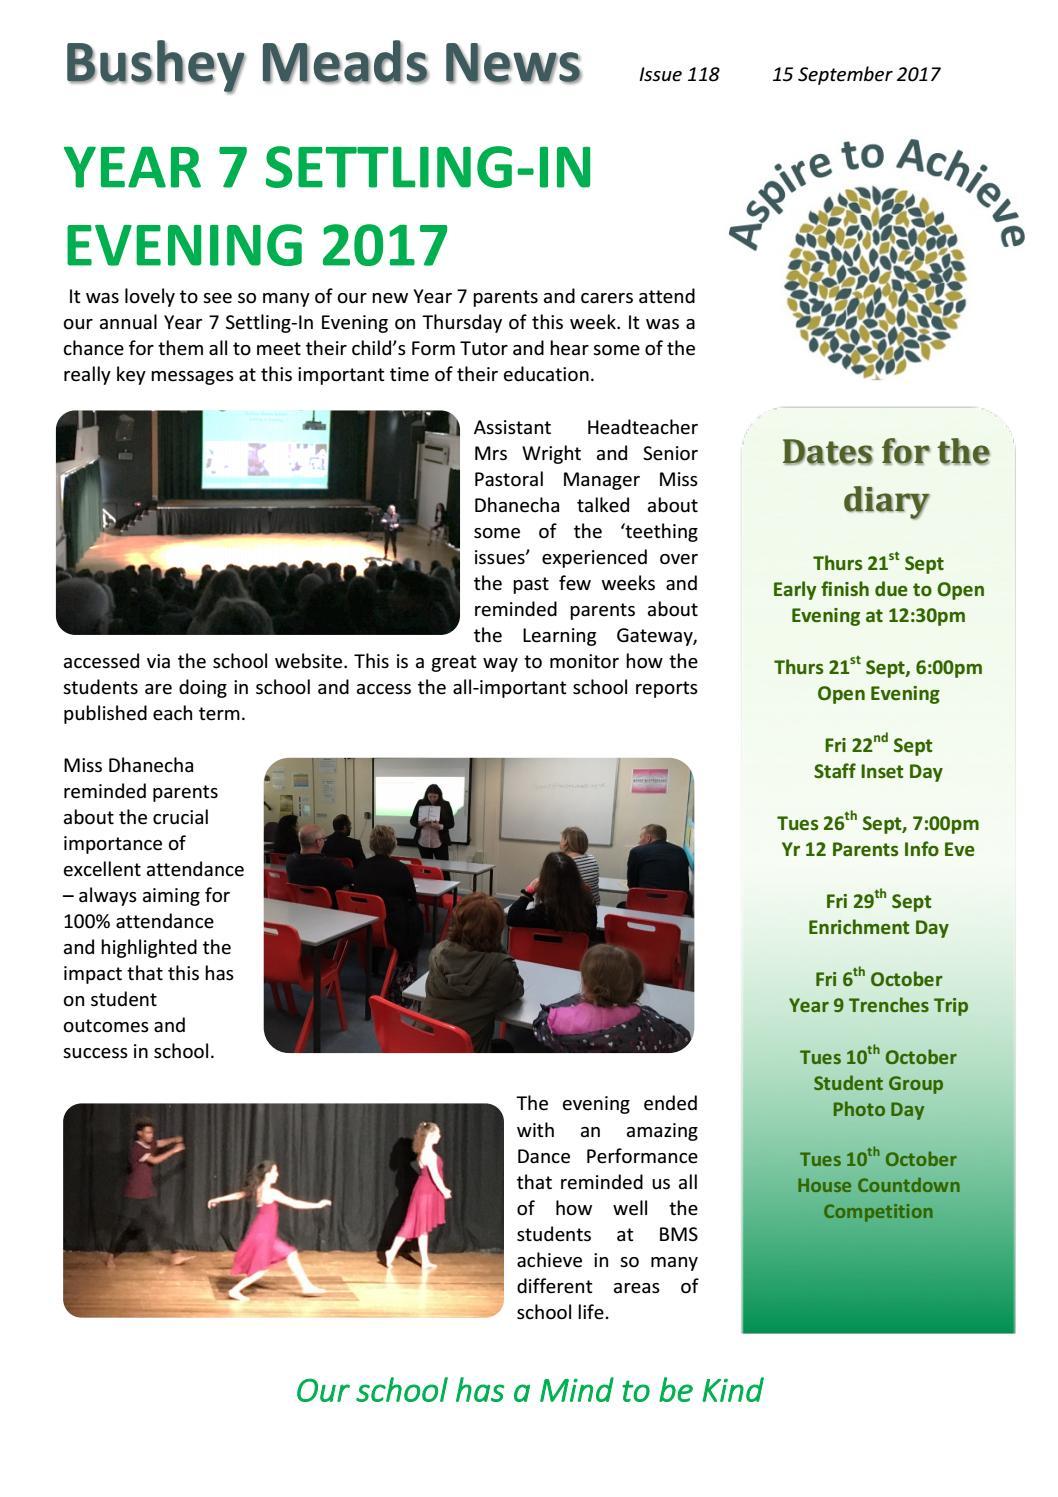 bushey meads news 15 september 2017 by bushey meads school issuu